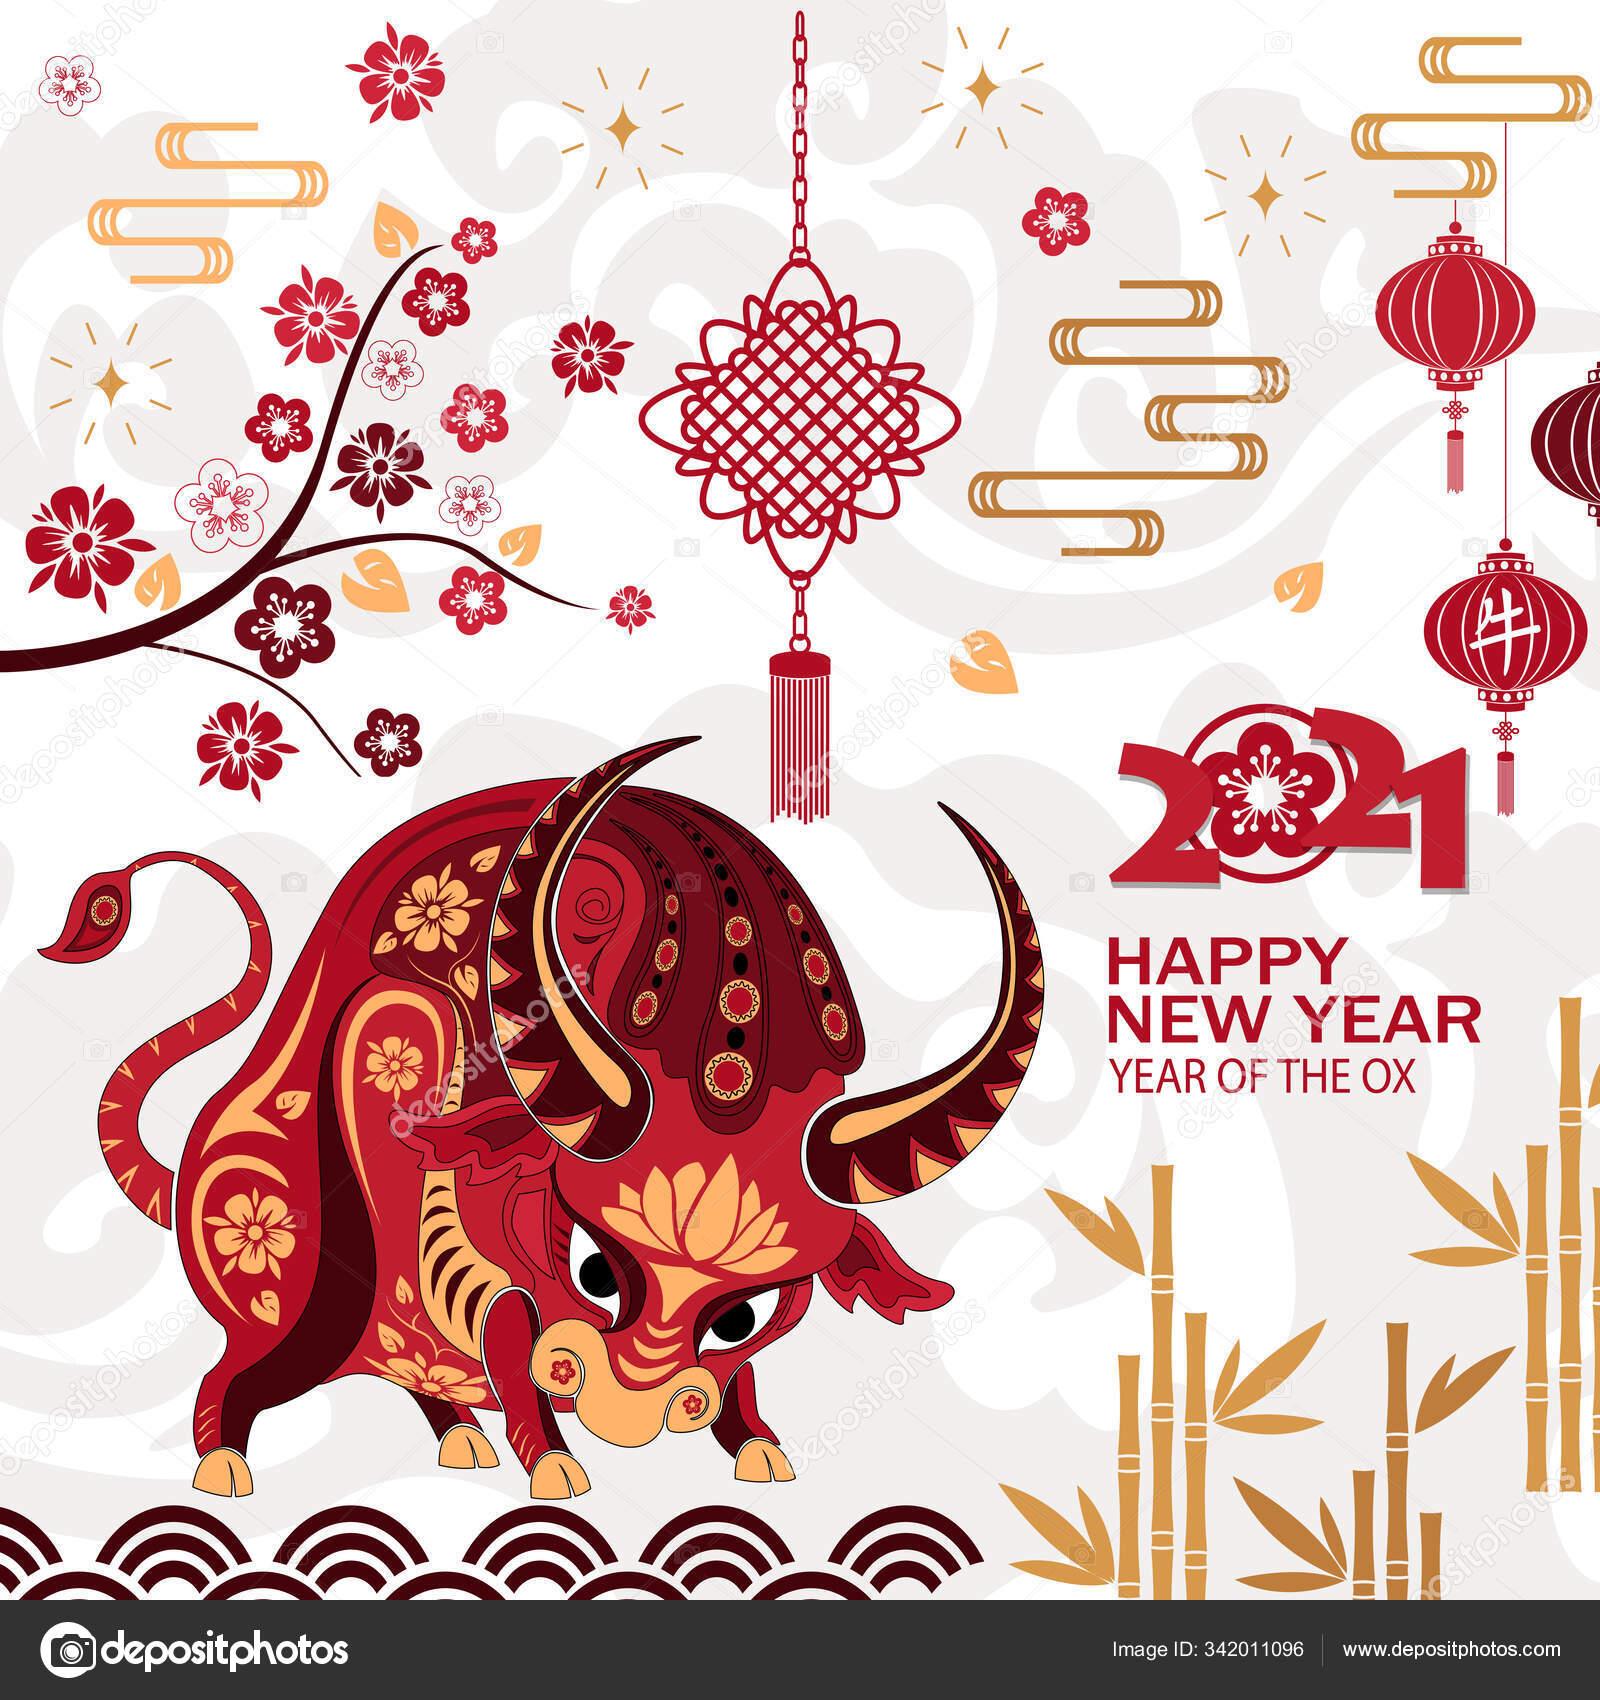 chinese new year 2021 background chinese translation ox stock vector c bezvetrenniy 342011096 https depositphotos com 342011096 stock illustration chinese new year 2021 background html